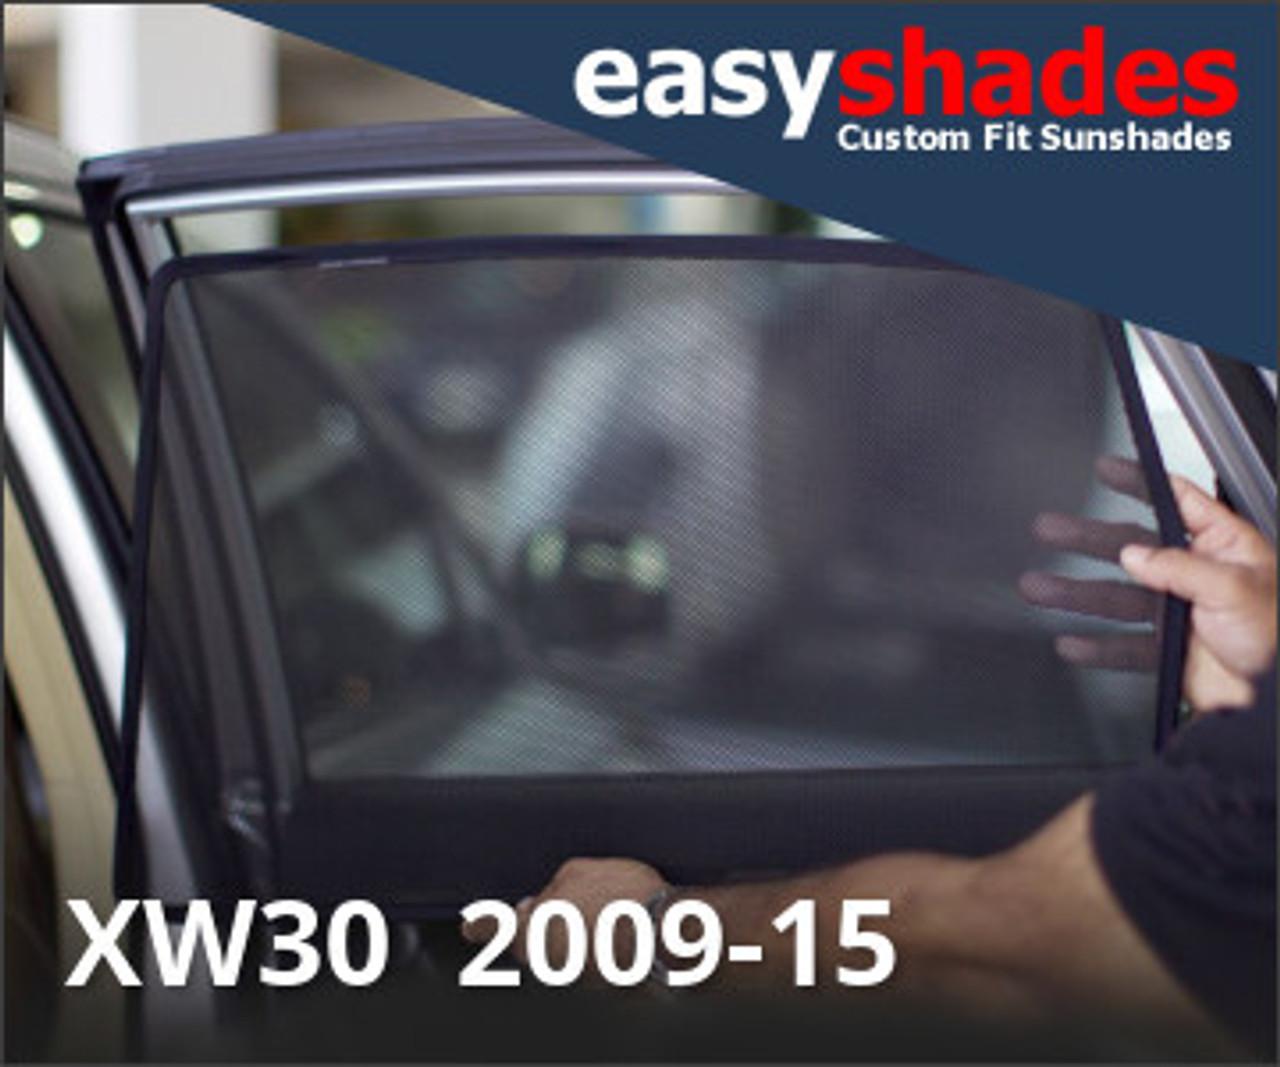 XW30 2009-15